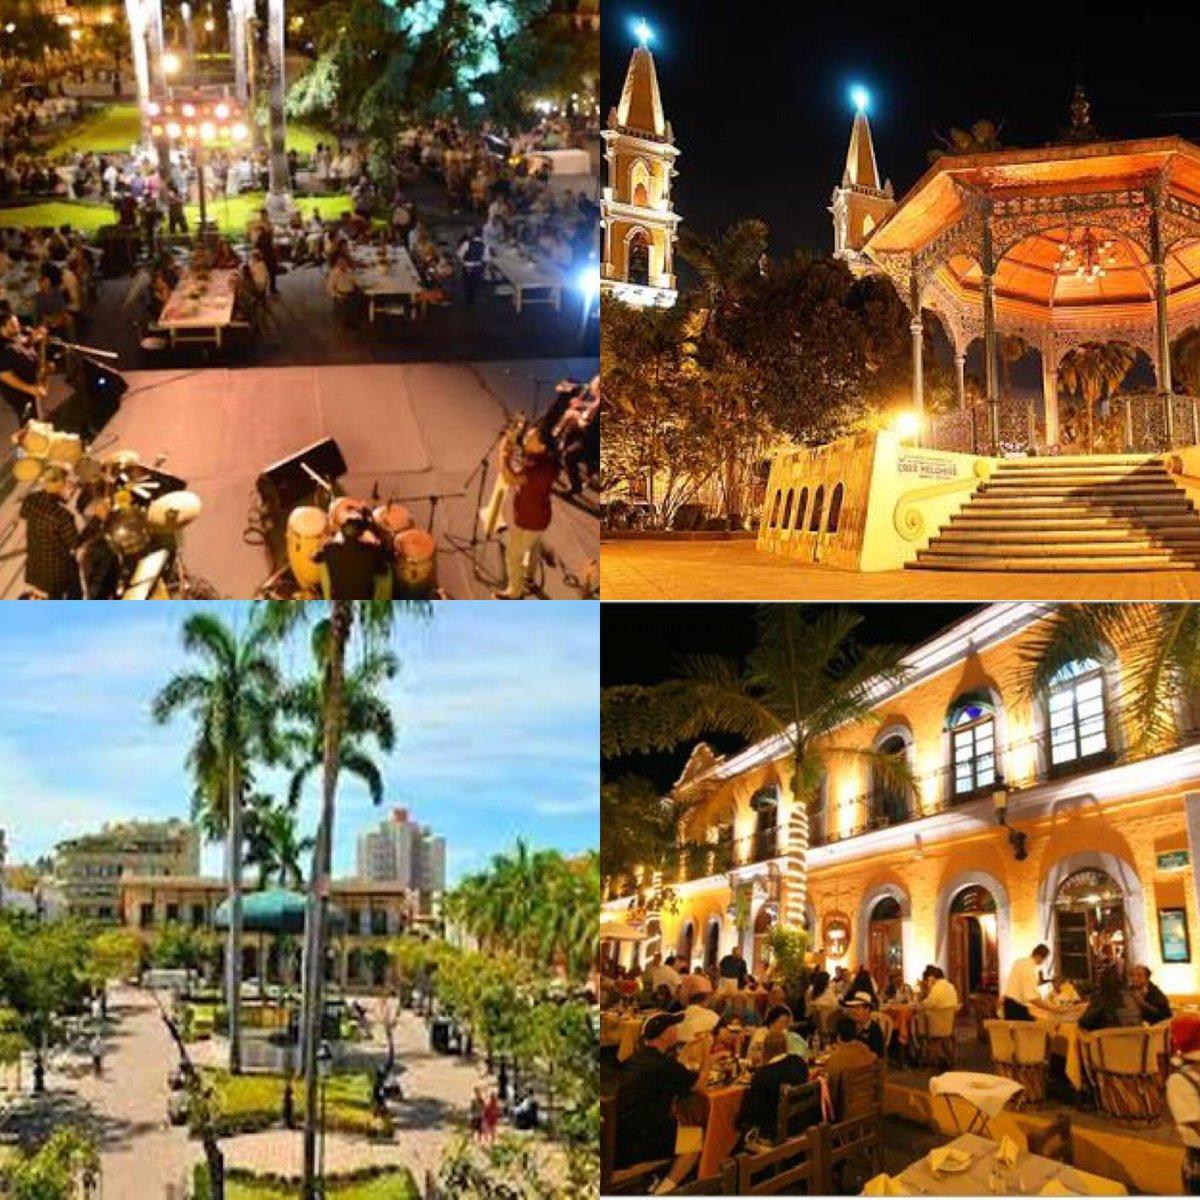 "Puerto Mazatlán در توییتر ""La Plazuela Machado es de las mas antiguas de  Mazatlán, donde podrás encontrar … https://t.co/N4yOGtqe0x #apimazatlan  @erce_barron @adyma73… https://t.co/DhdeOUhhQZ"""